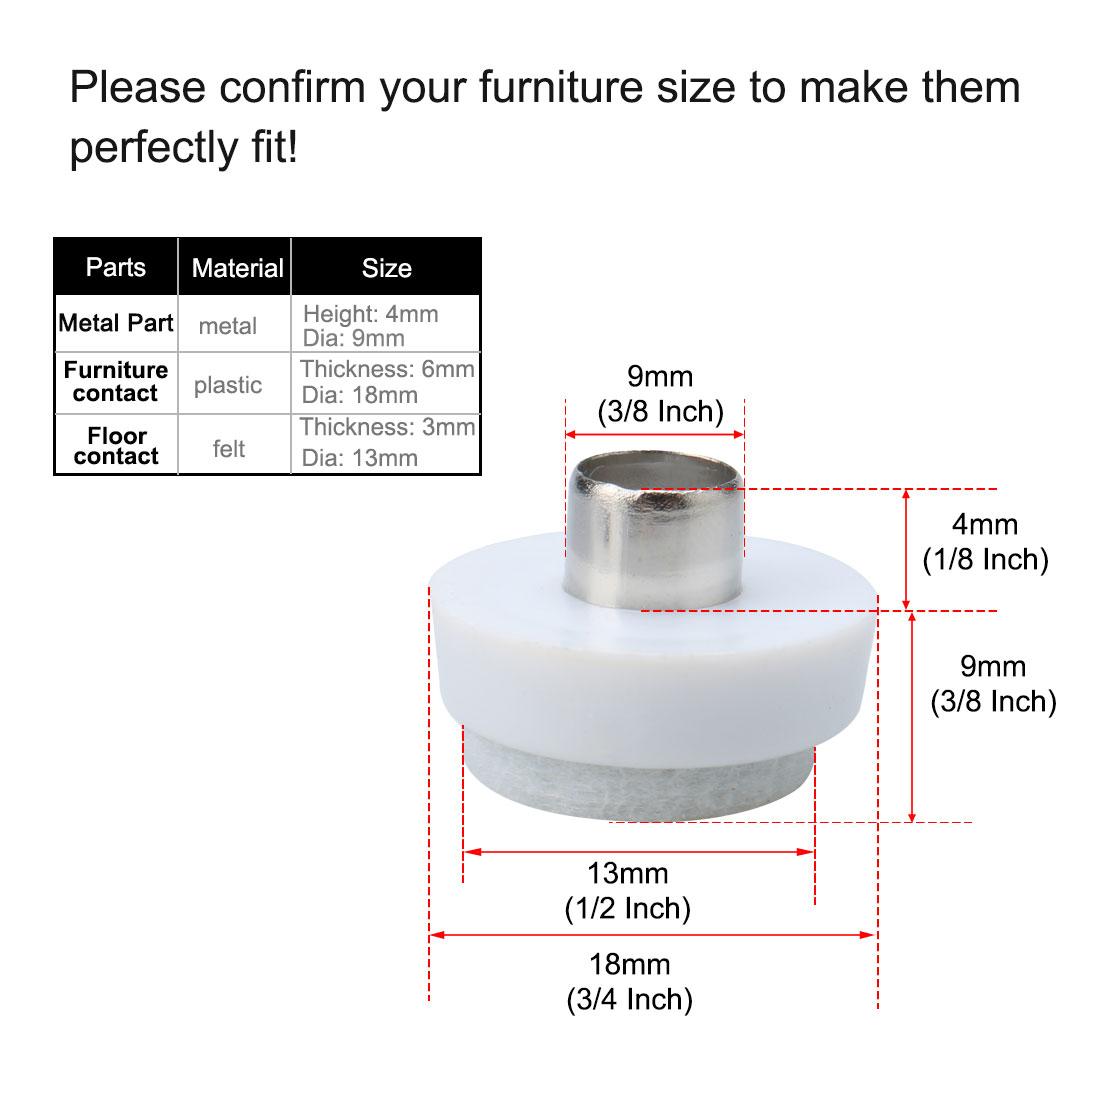 "18pcs Nail on Felt Pads for Furniture Chair Leg 3/4"" 18mm Dia Floor Protector - image 2 de 7"